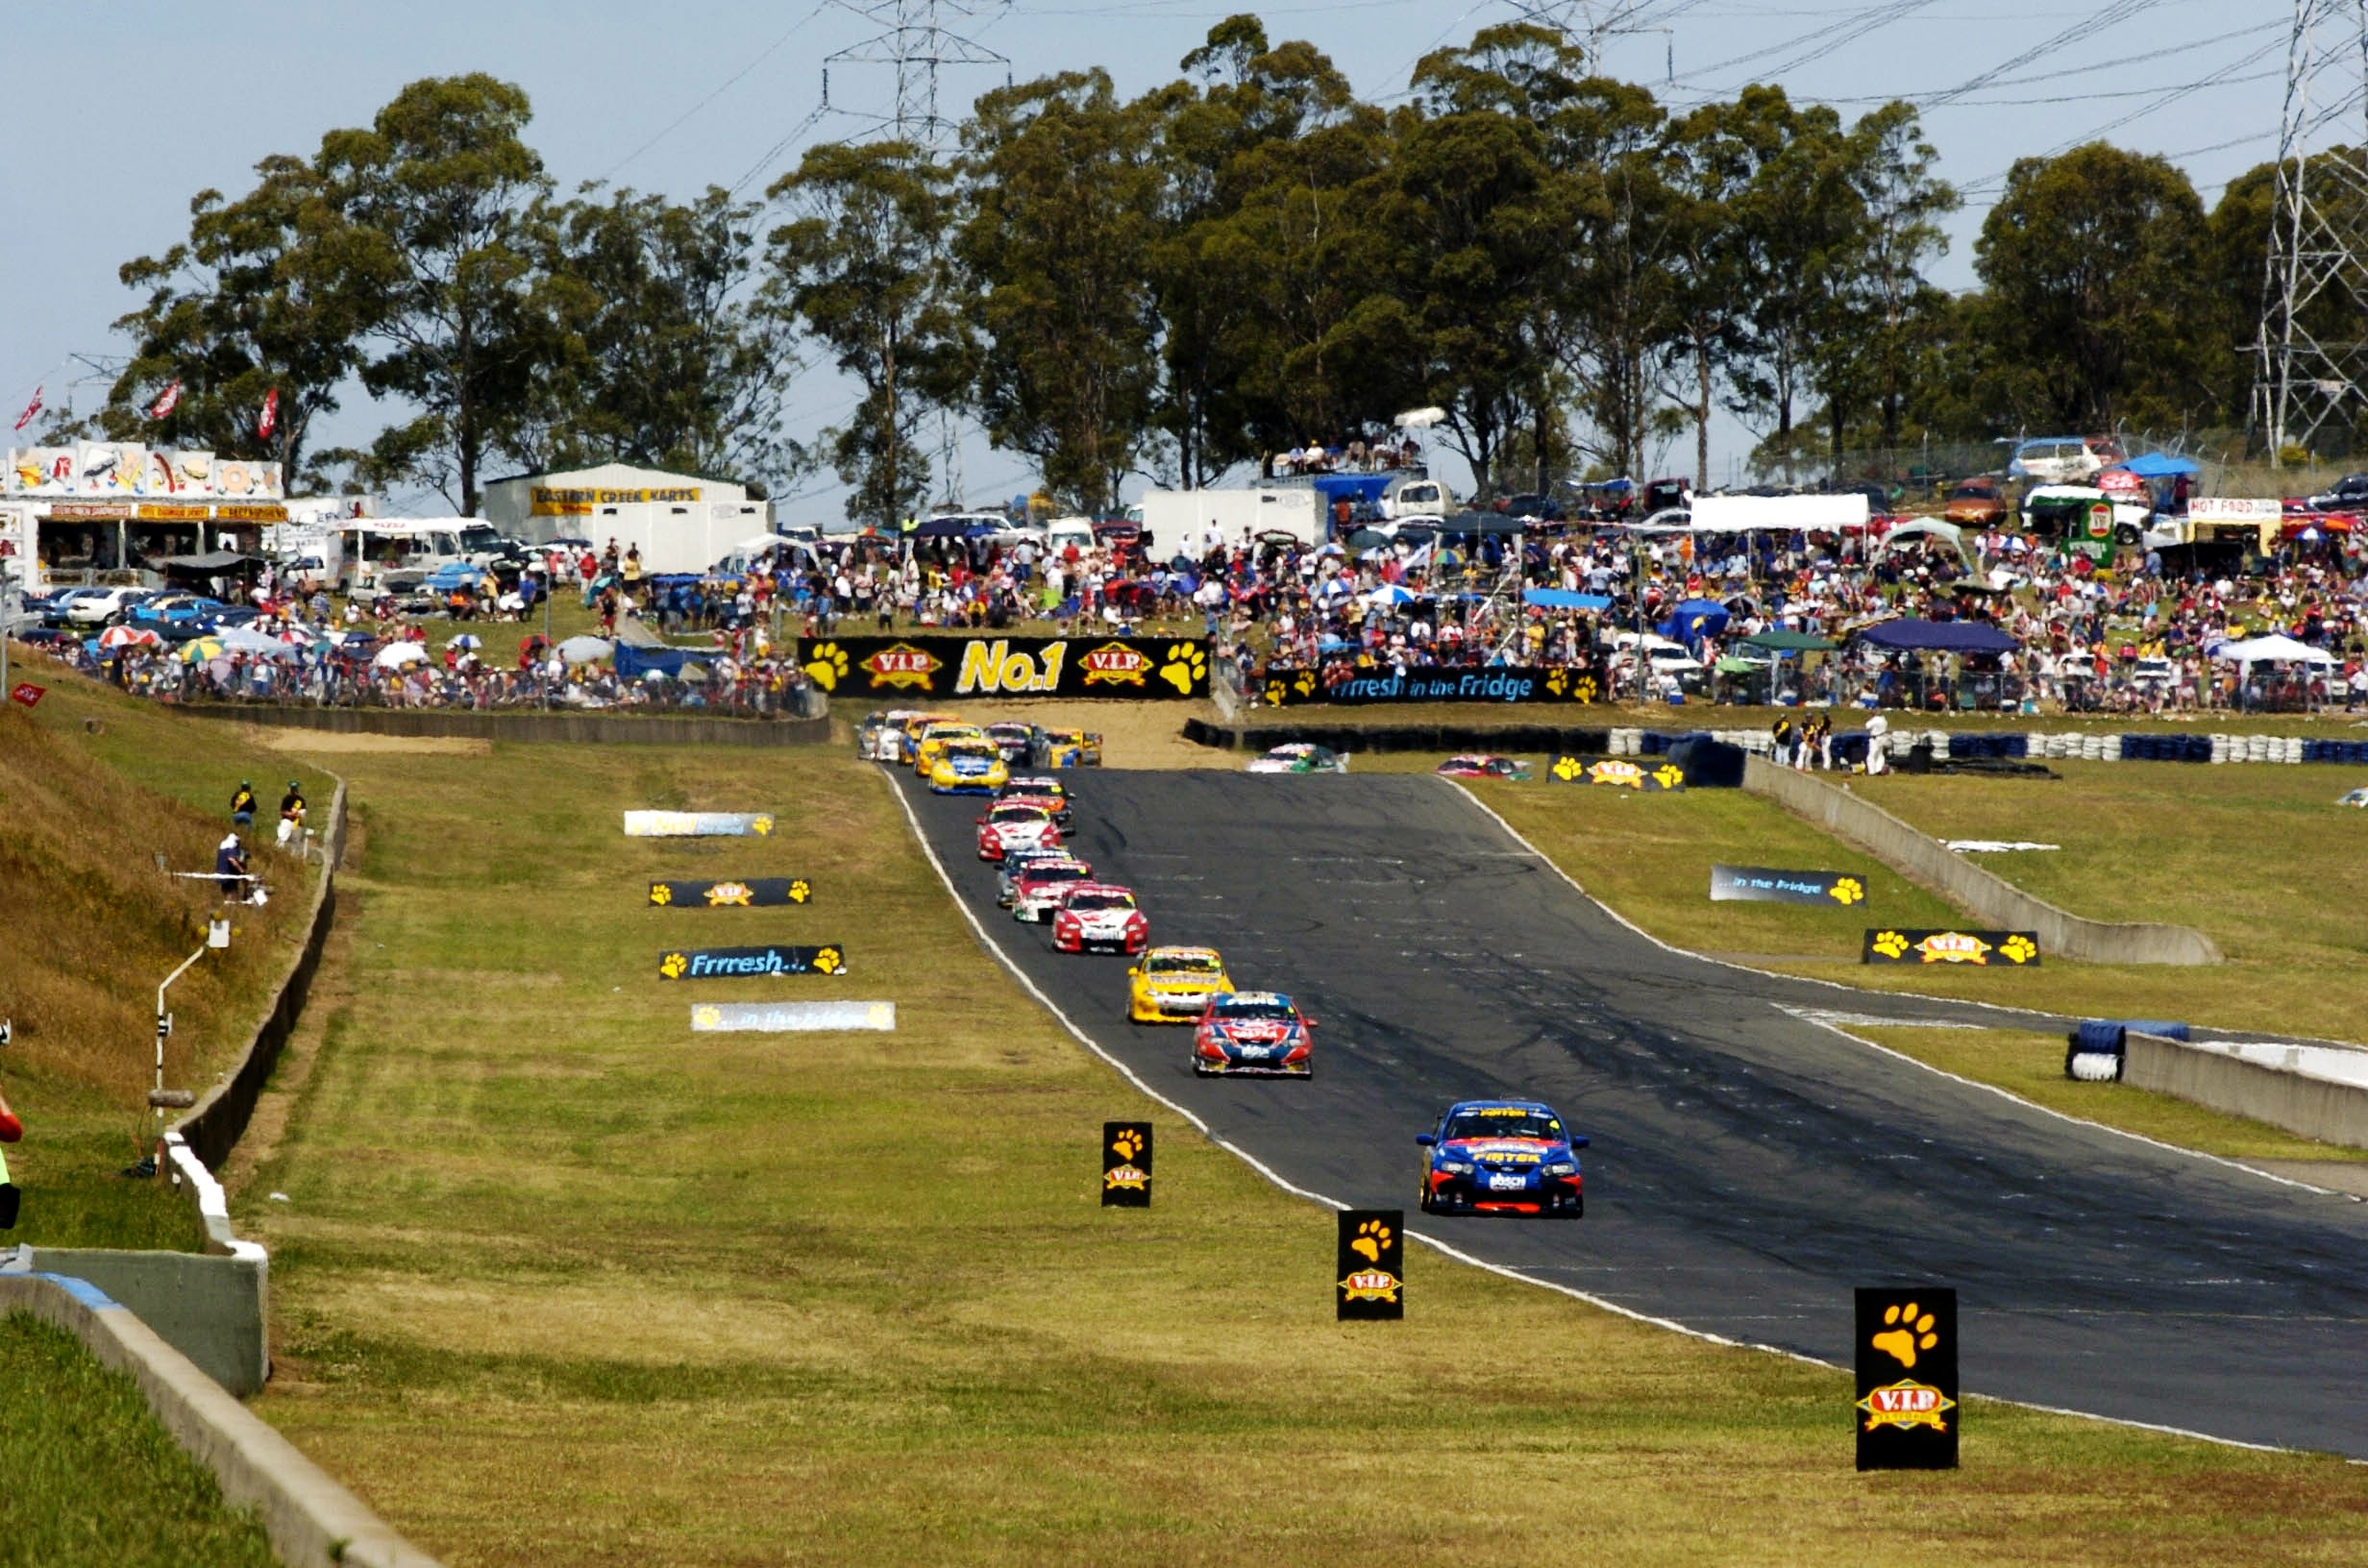 V8 Supercars at Sydney Motorsport Park